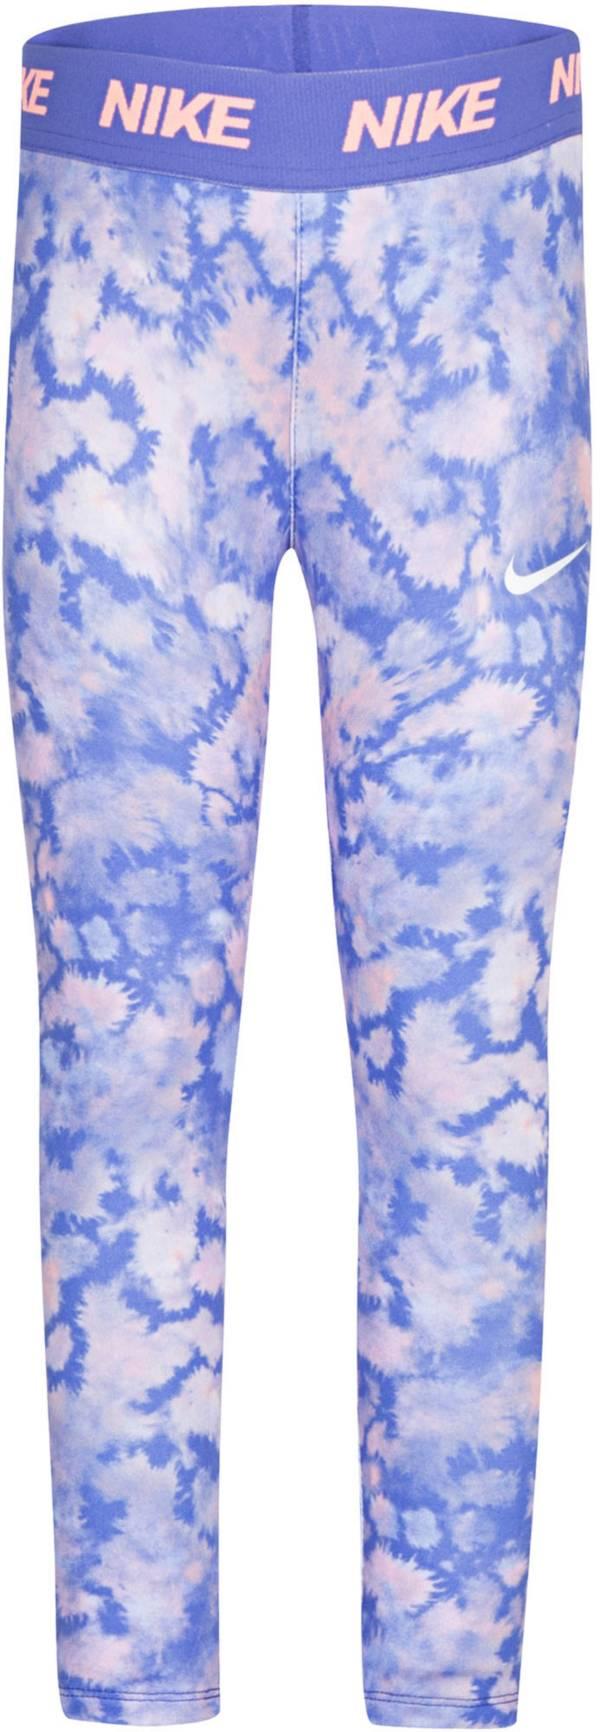 Nike Little Girls' Dri-FIT Rainbow Wash Leggings product image